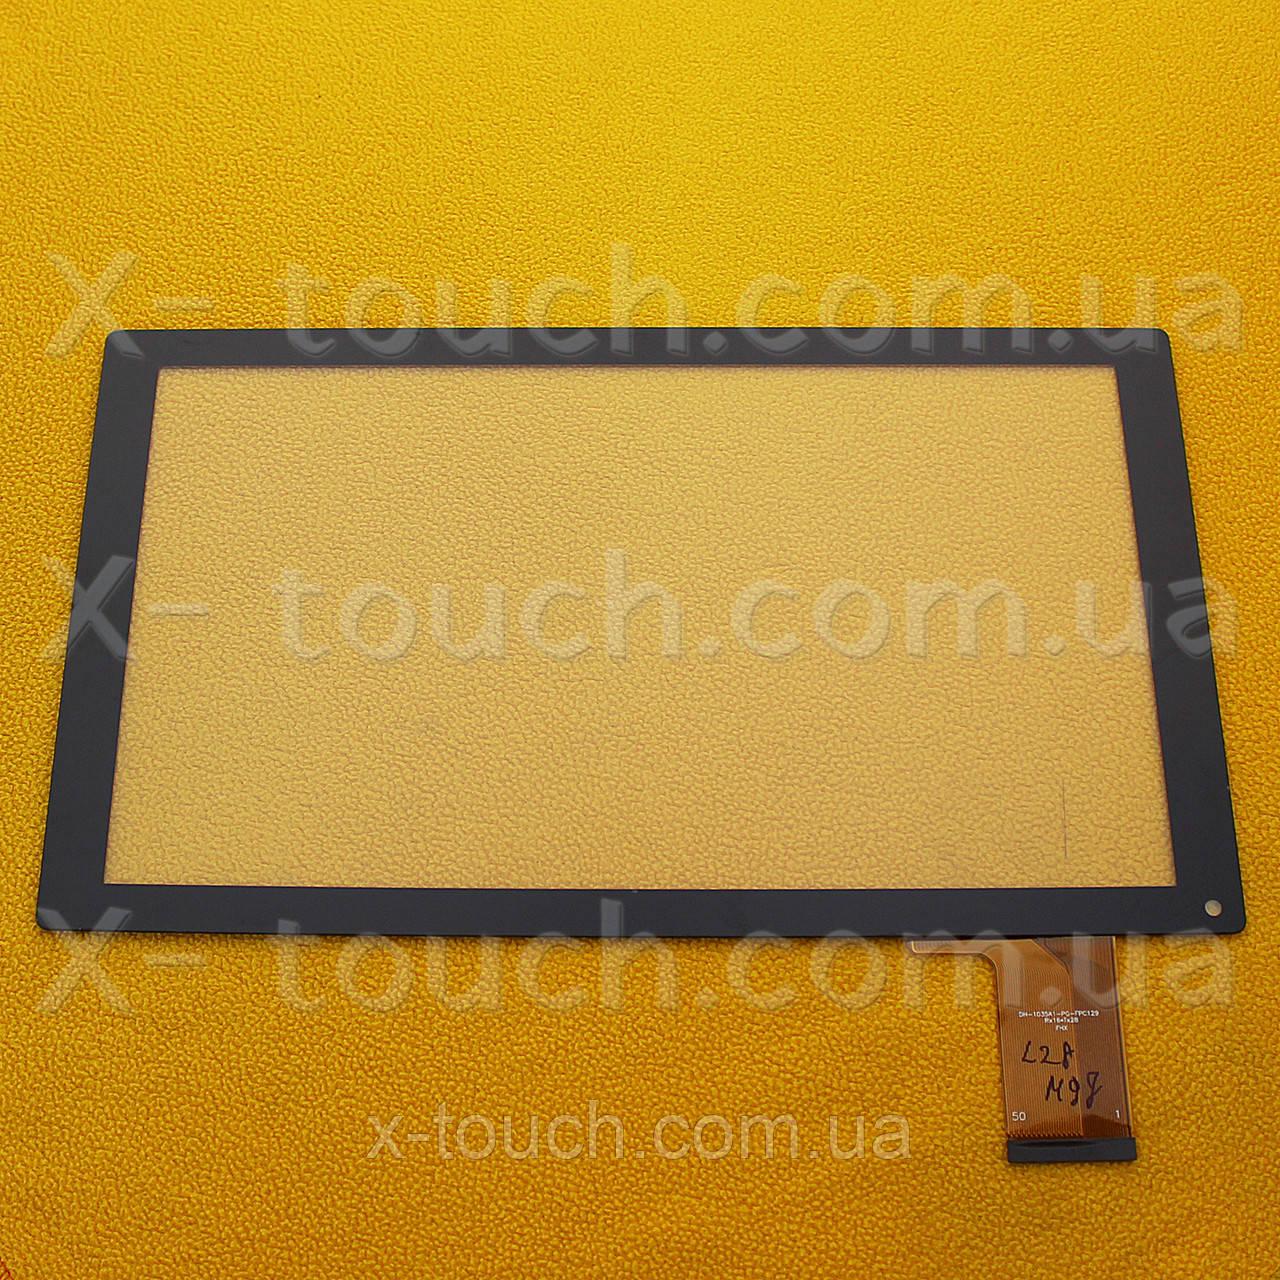 Тачскрин, сенсор  CN131C1010G12V0  для планшета